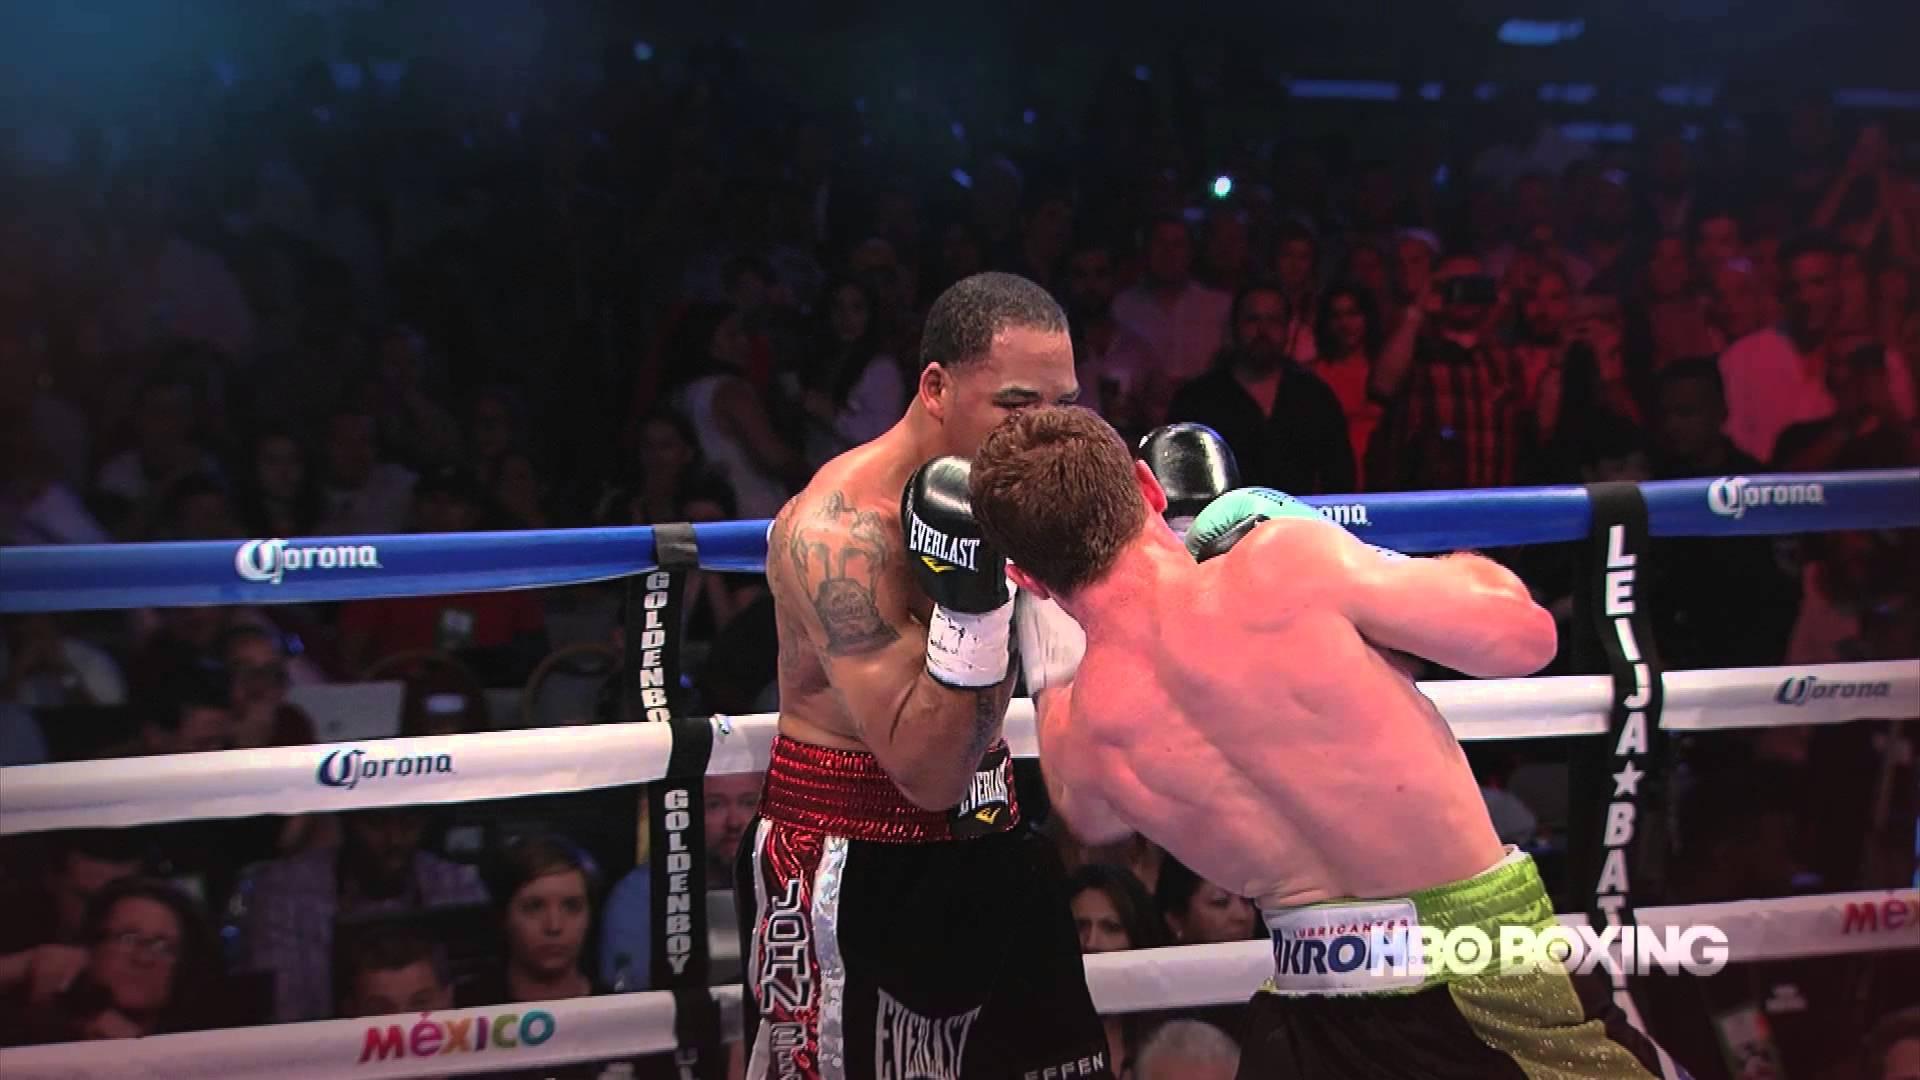 Canelo Alvarez knocks out James Kirkland with a hard blow